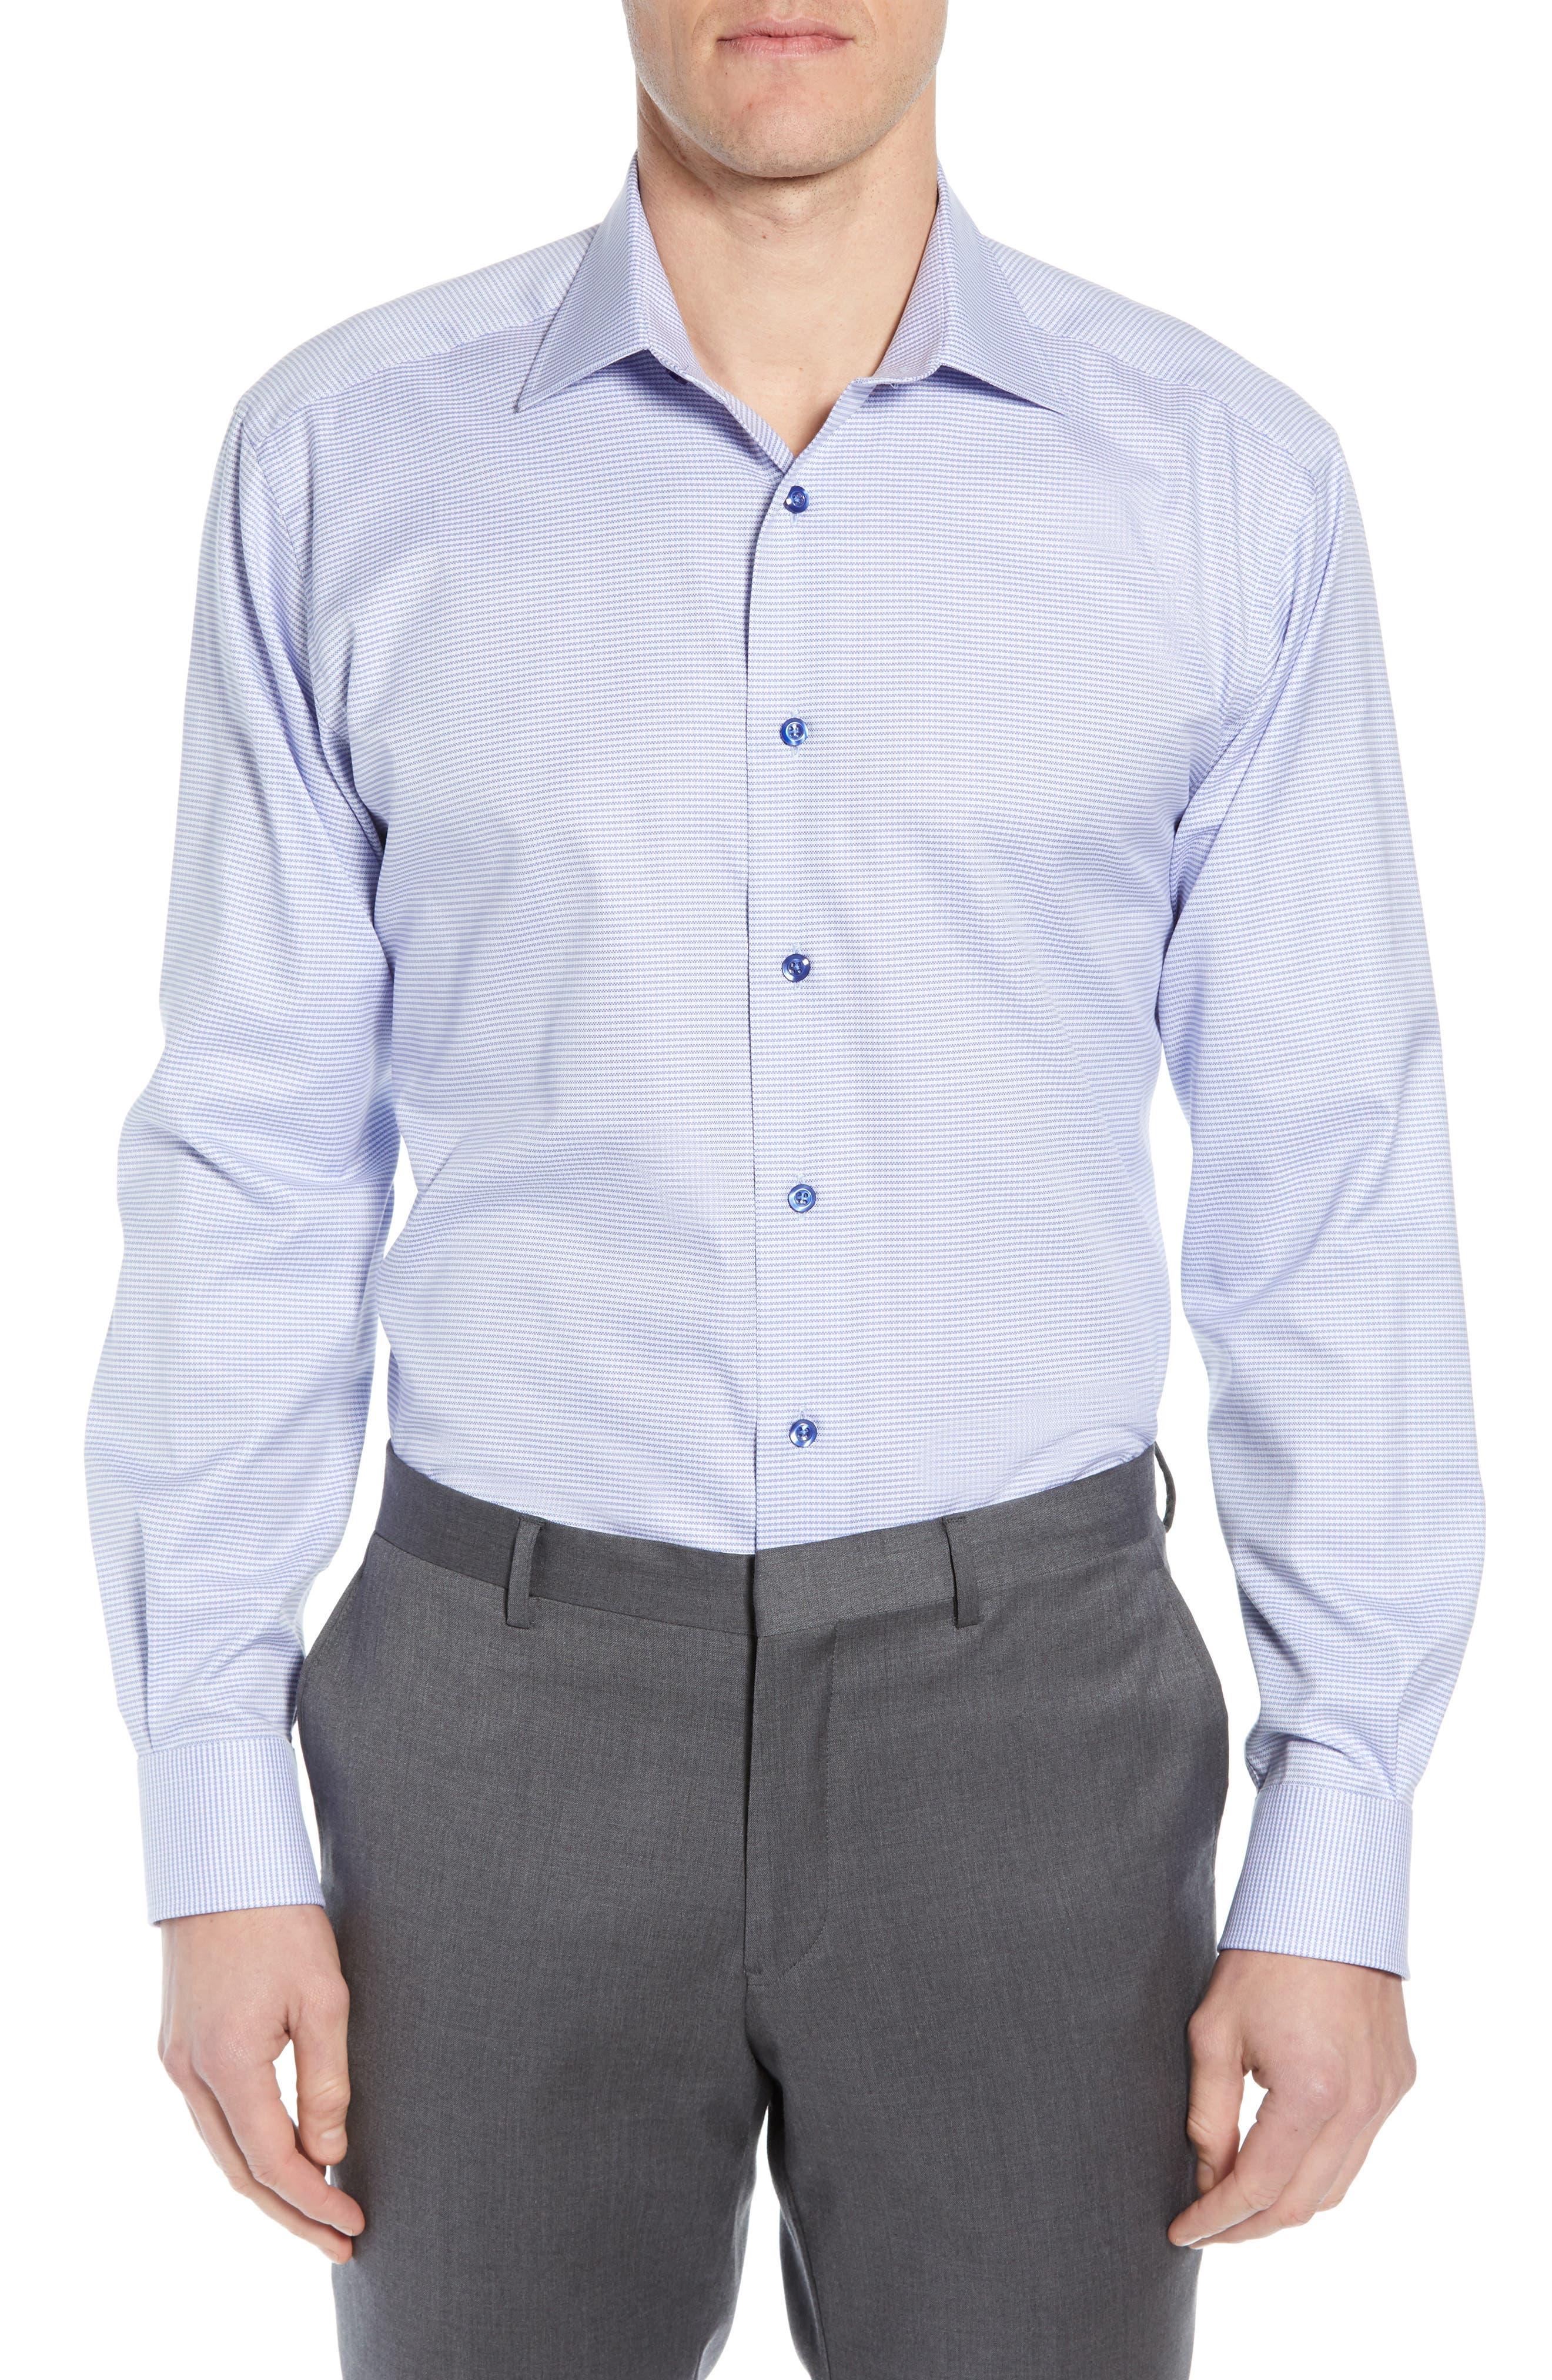 Men'S Regular-Fit Micro-Gingham Dress Shirt in Blue